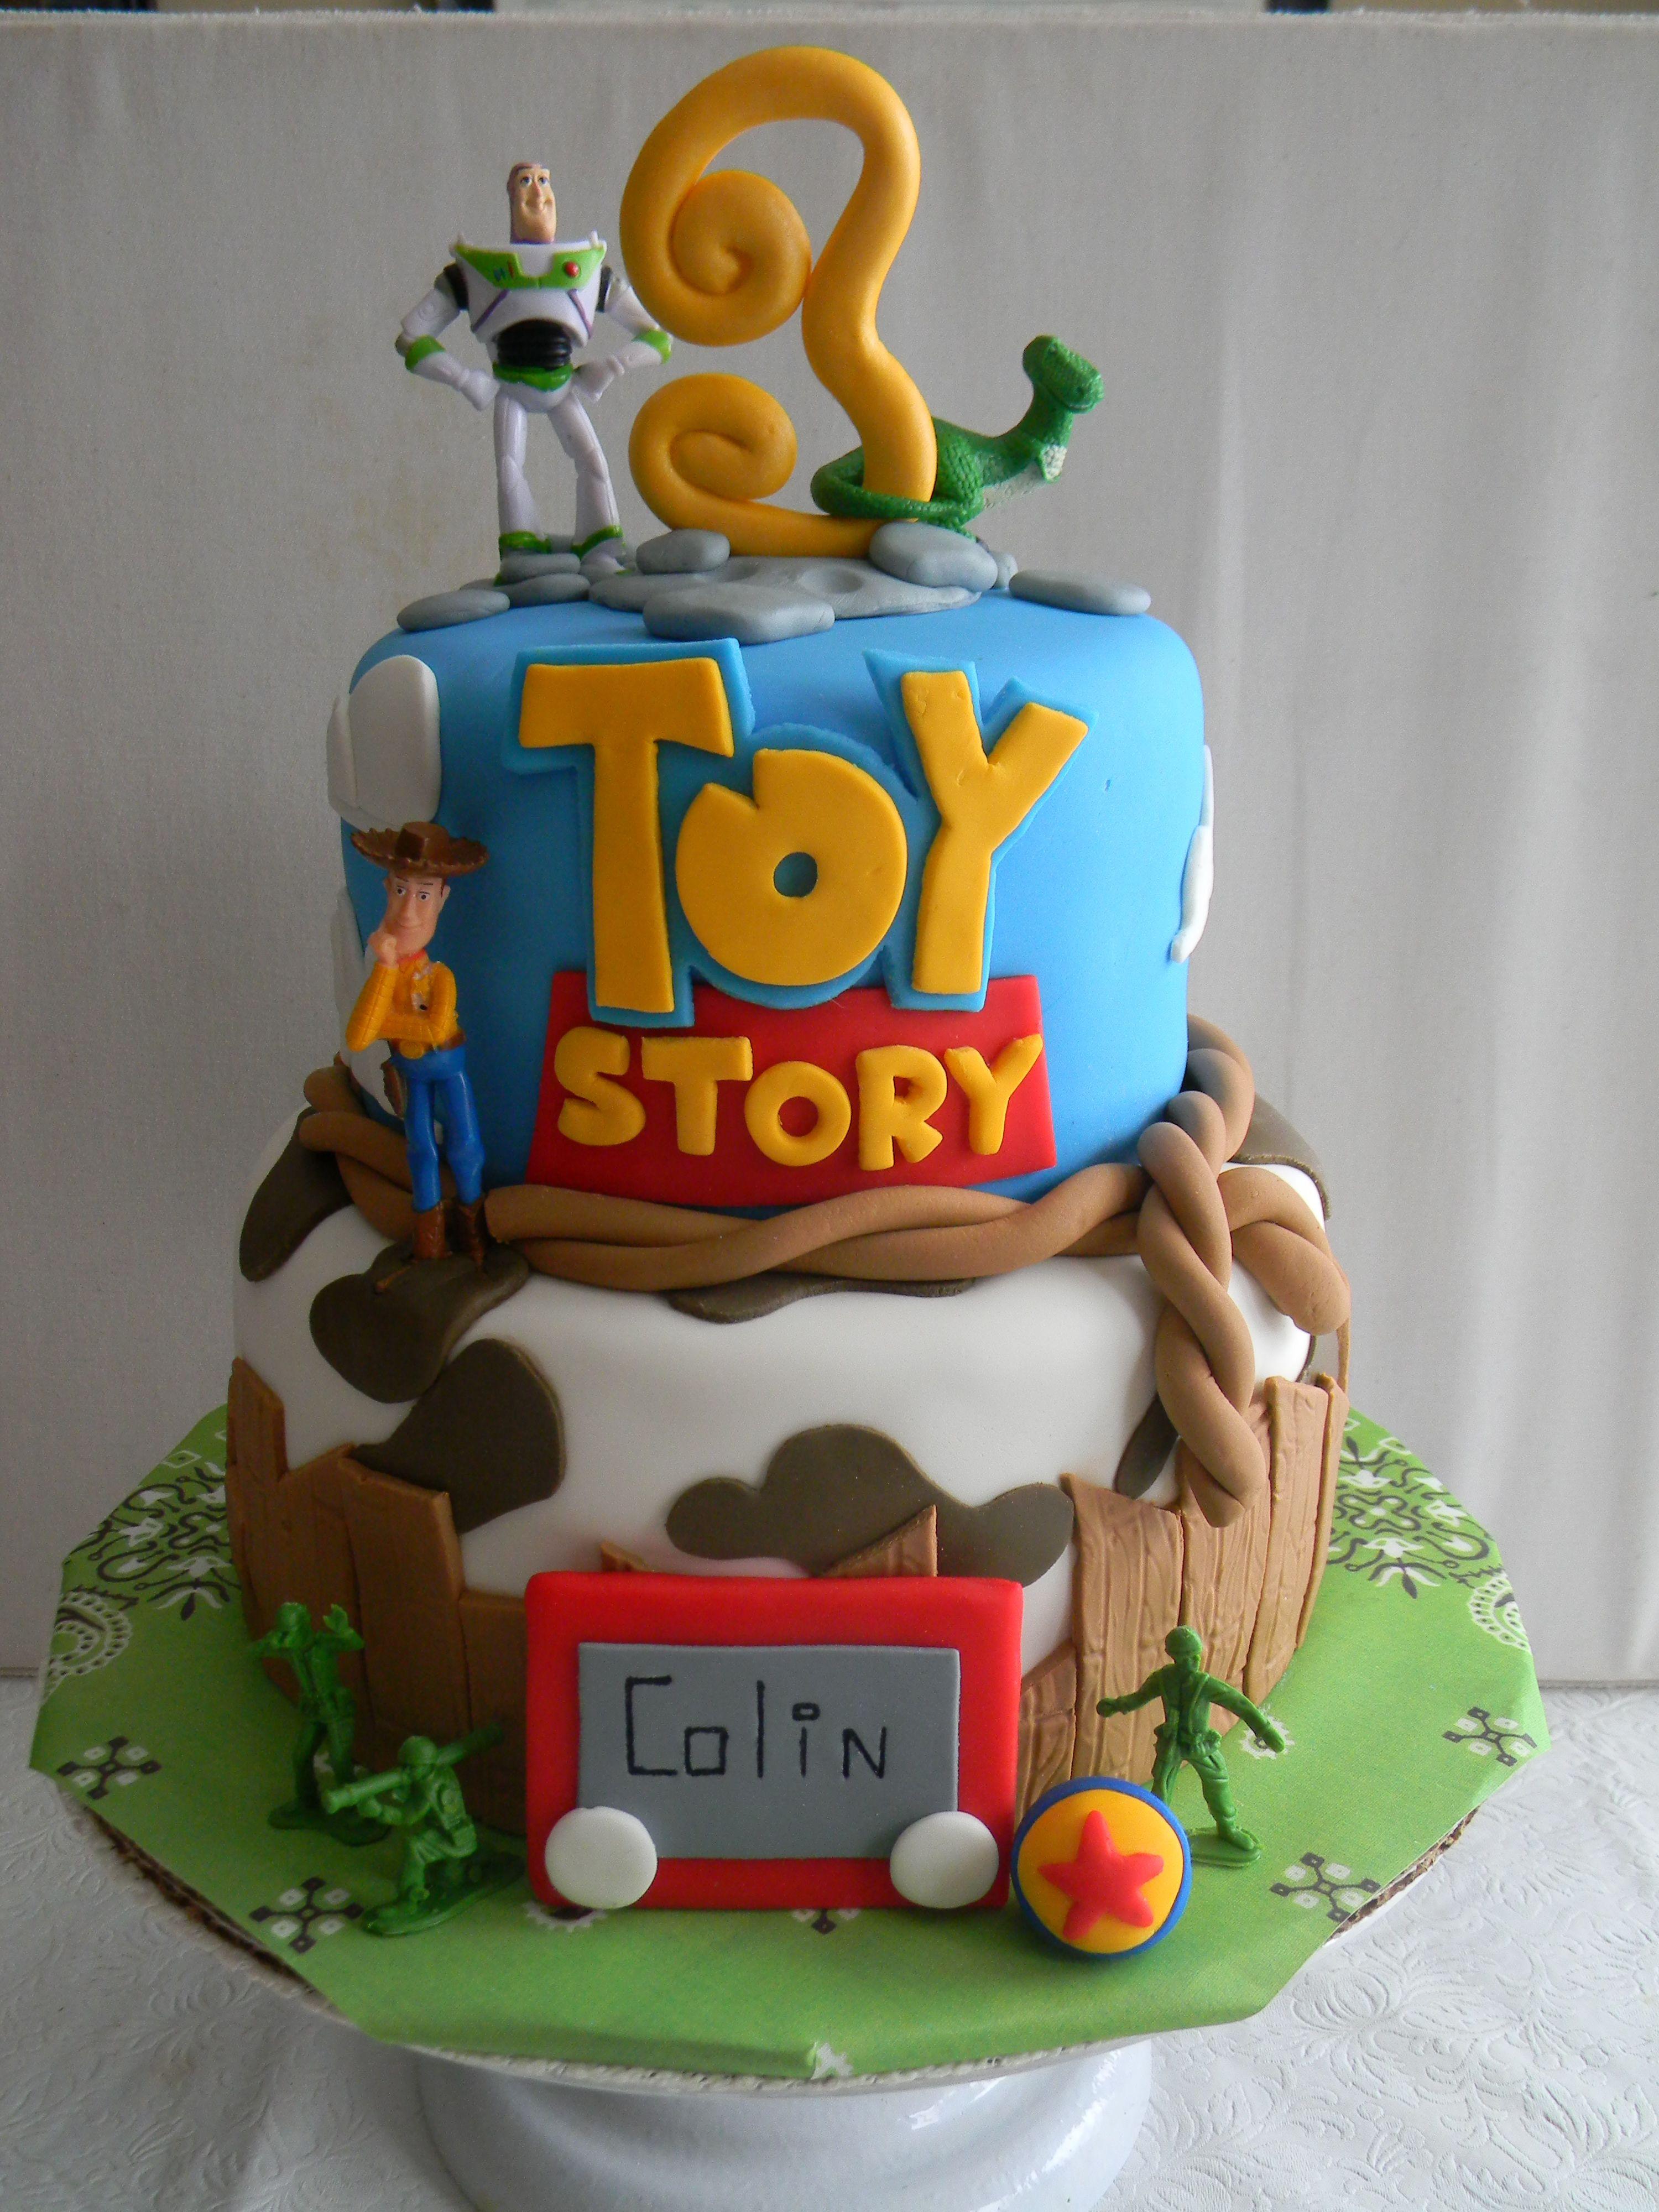 Toy Story Birthday Cakes Ideas  Toy Story themed birthday cake